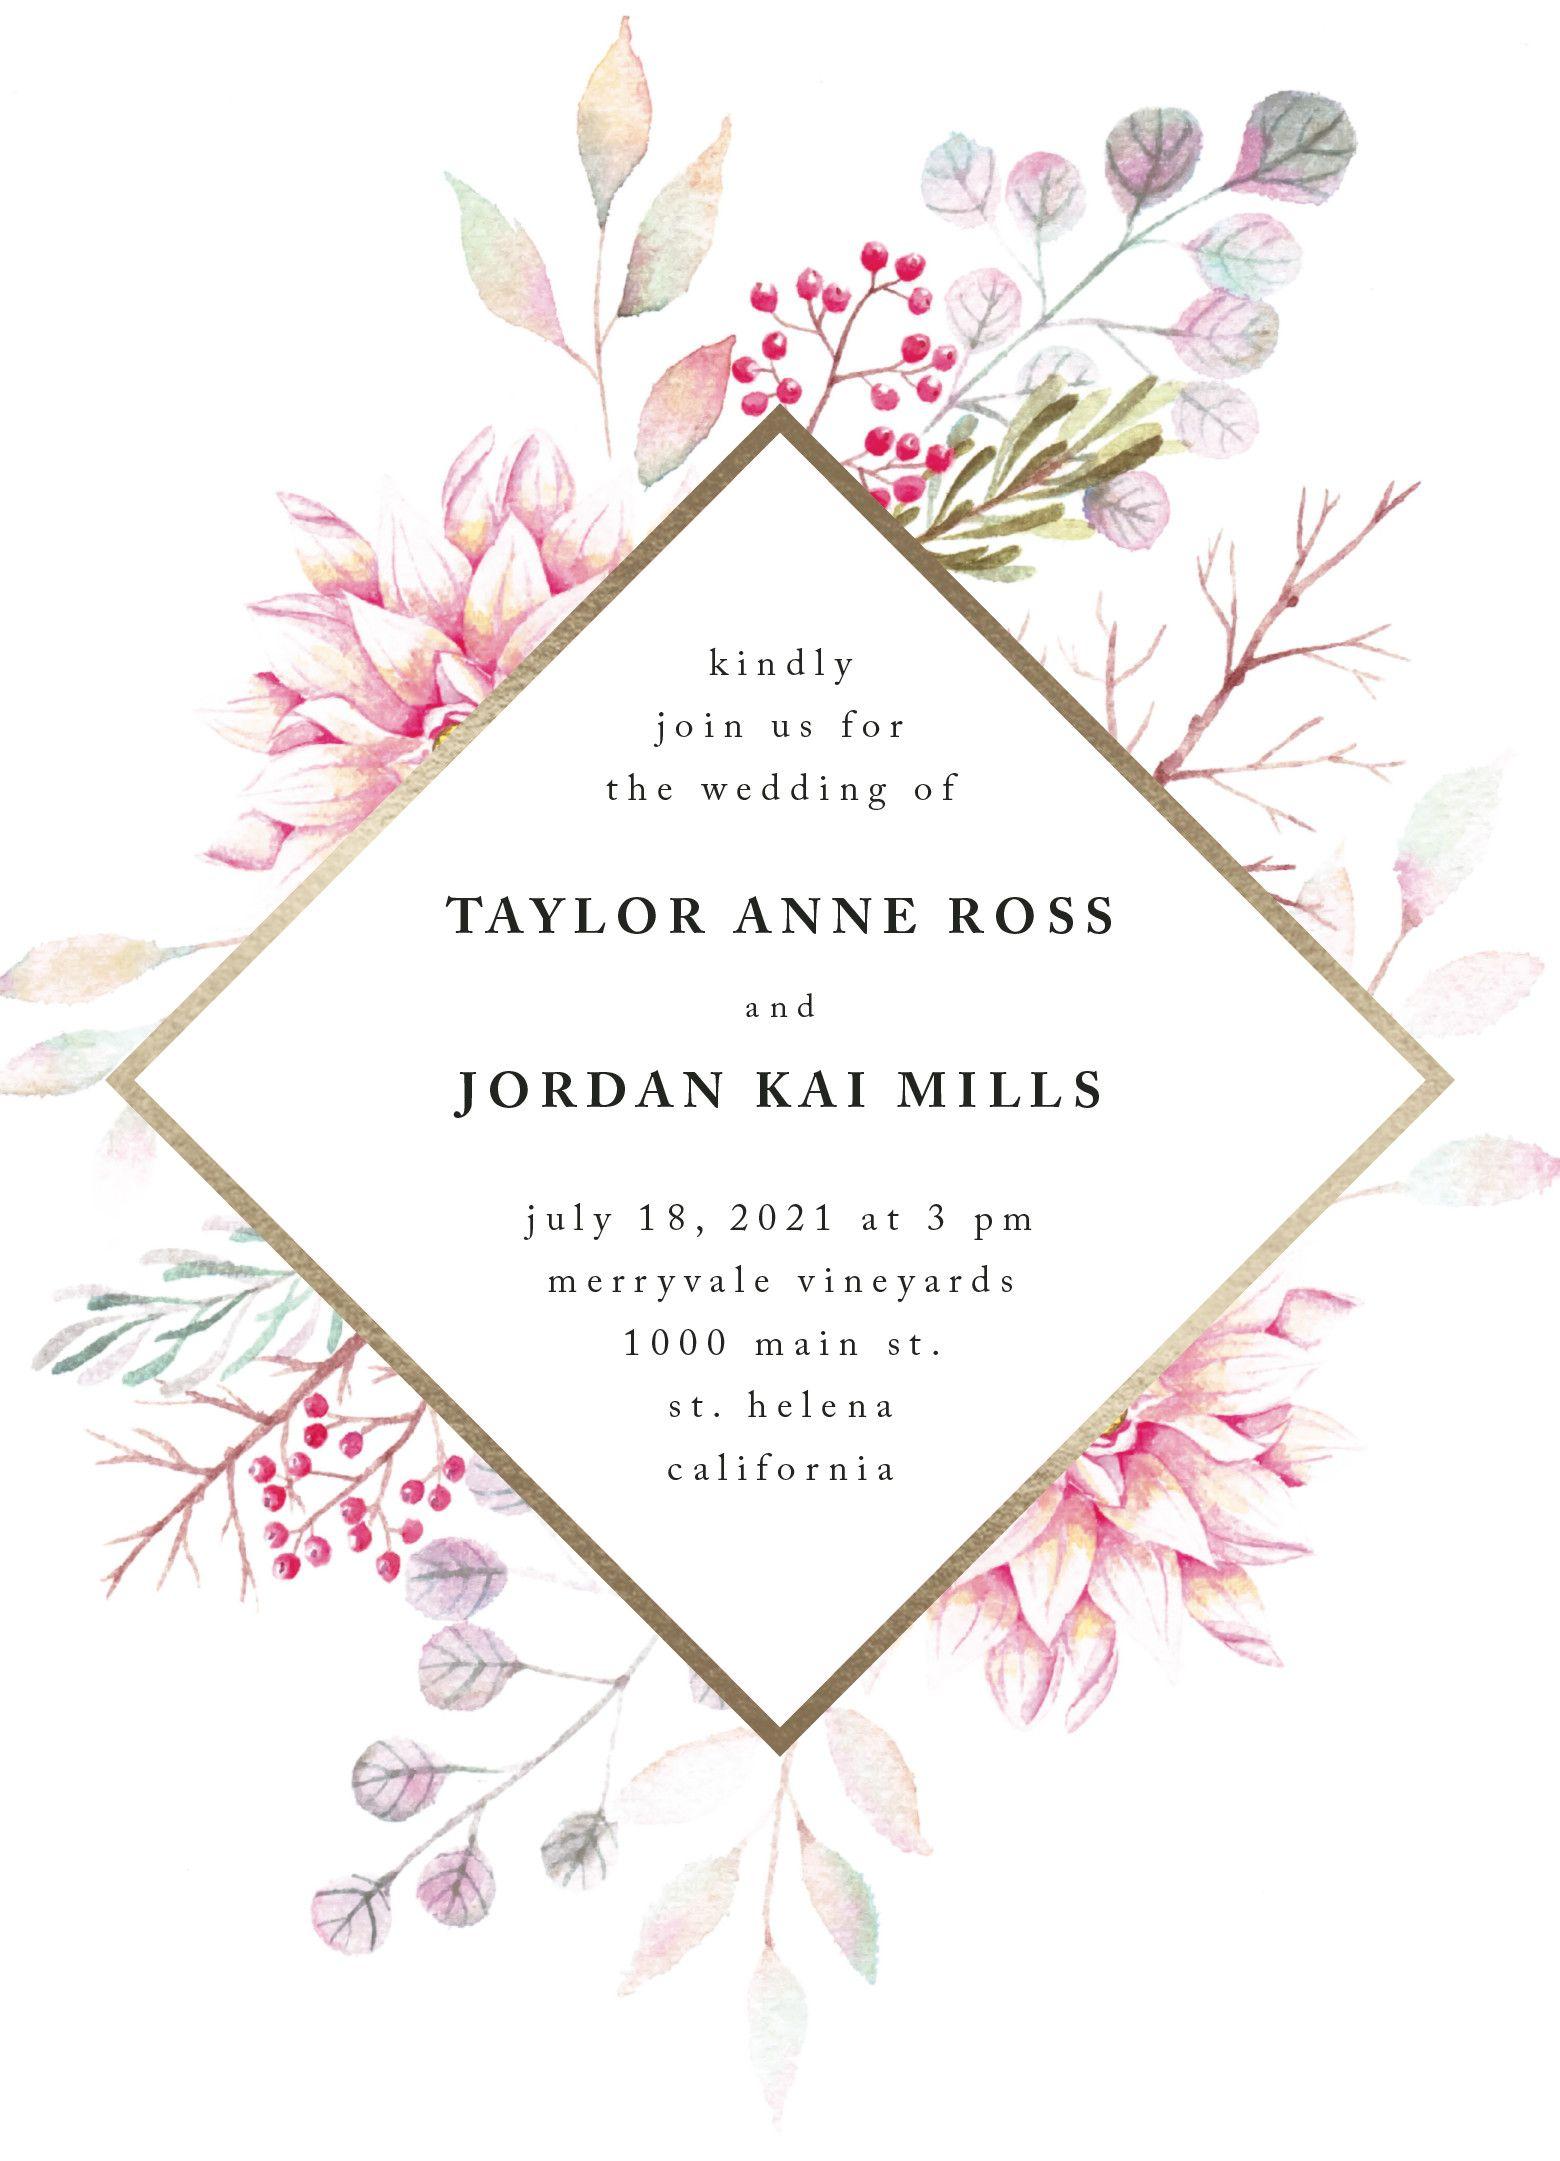 Ascent Foil Pressed Wedding Invitation Design By Minted